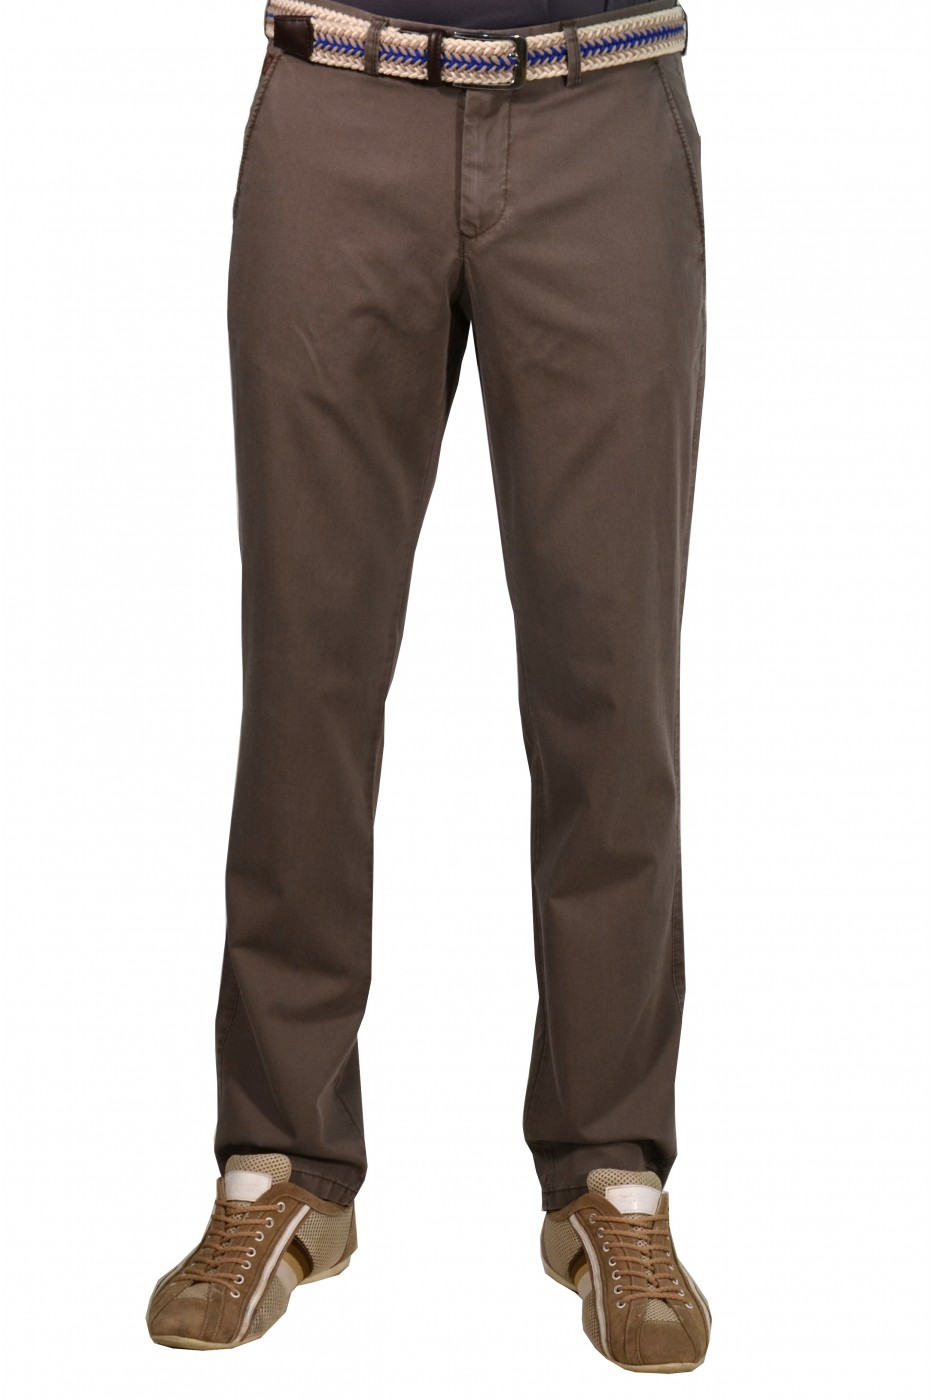 Коричневые мужские брюки чинос BANKO (BEIGE)